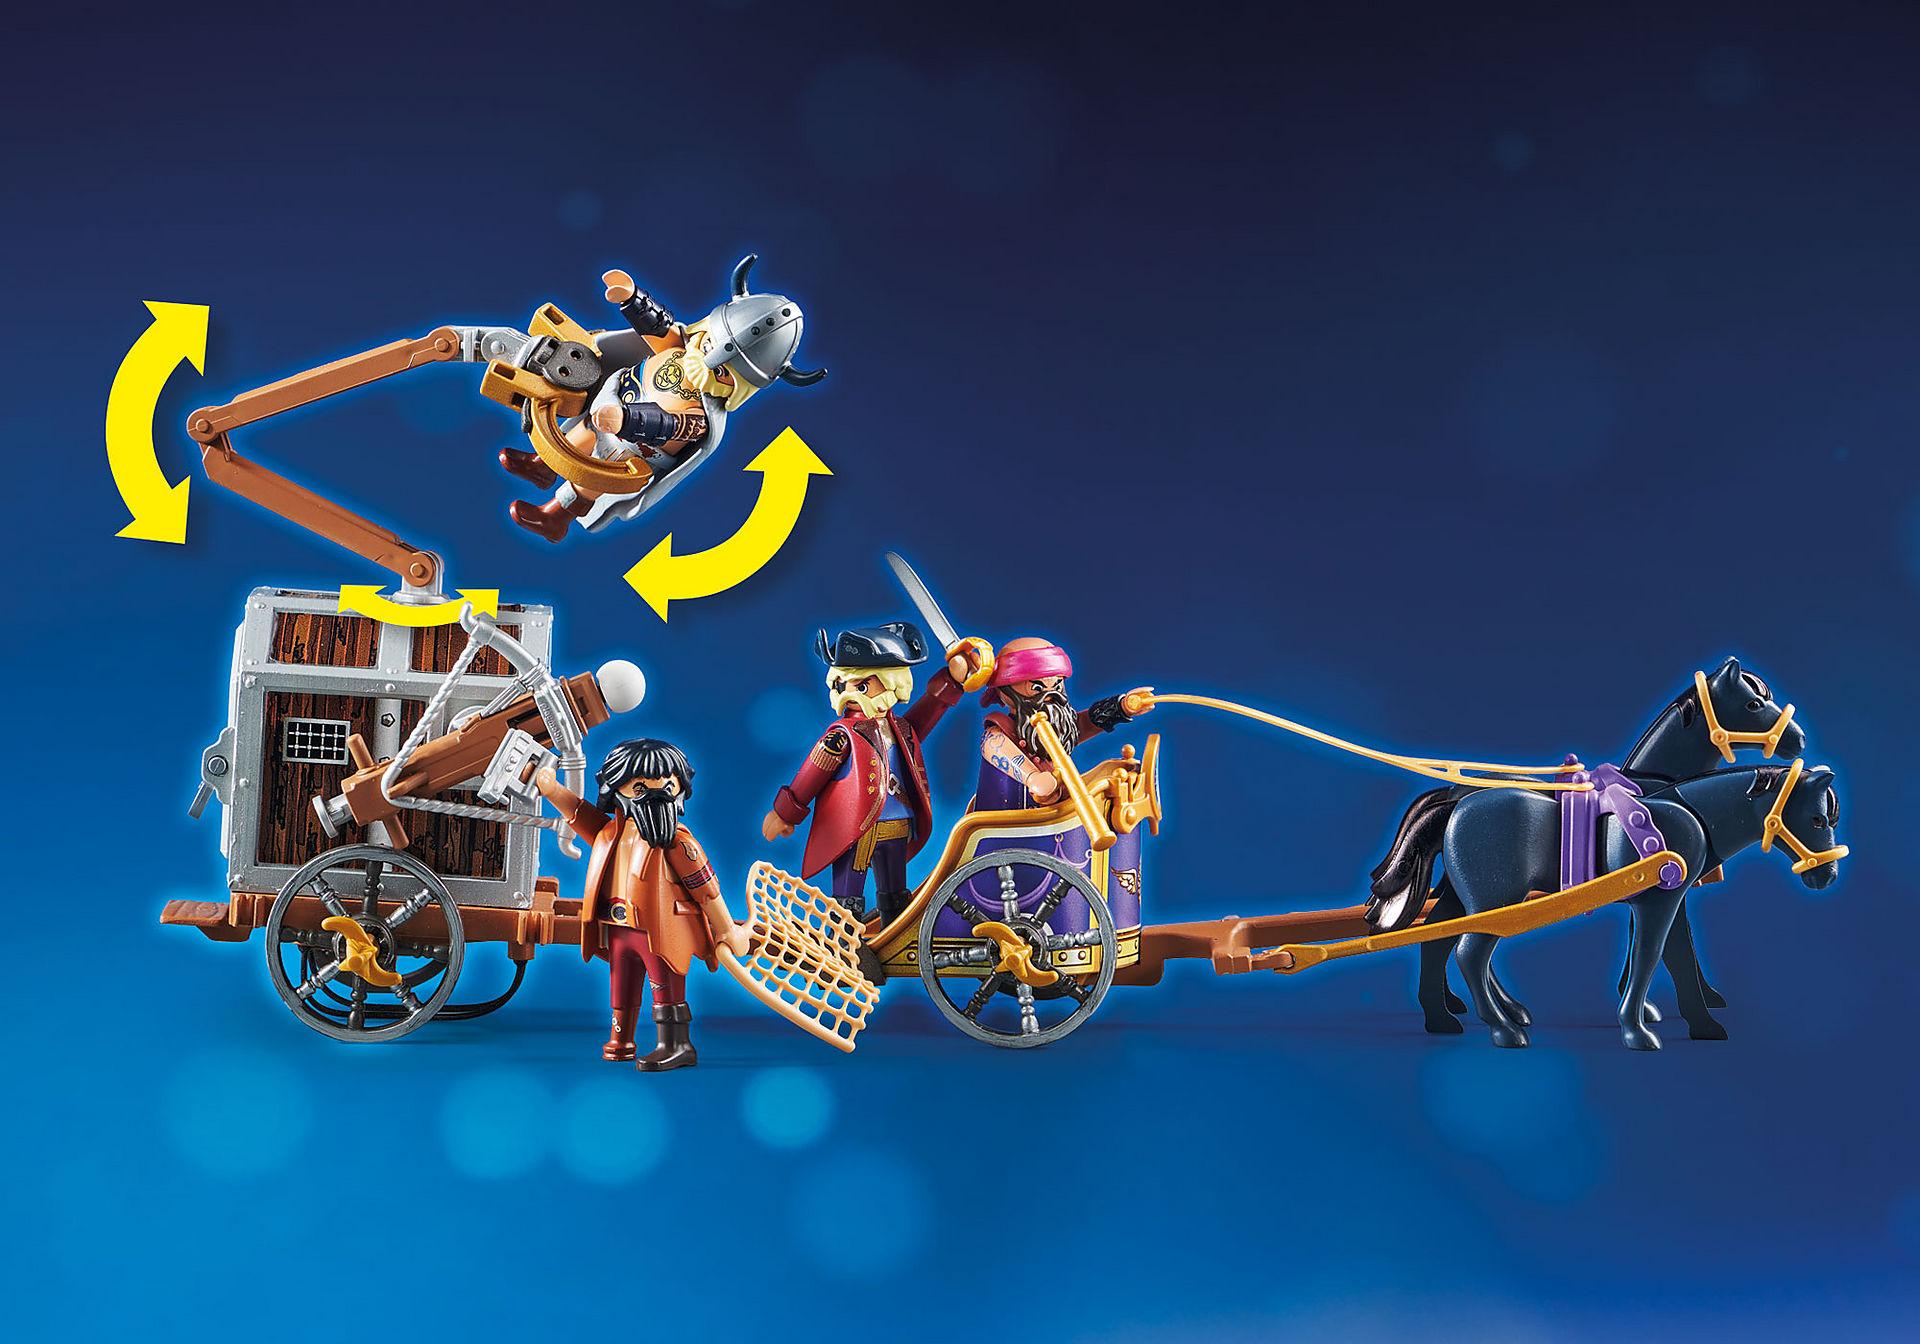 http://media.playmobil.com/i/playmobil/70073_product_extra3/PLAYMOBIL: THE MOVIE Charlie con Carro Prisión